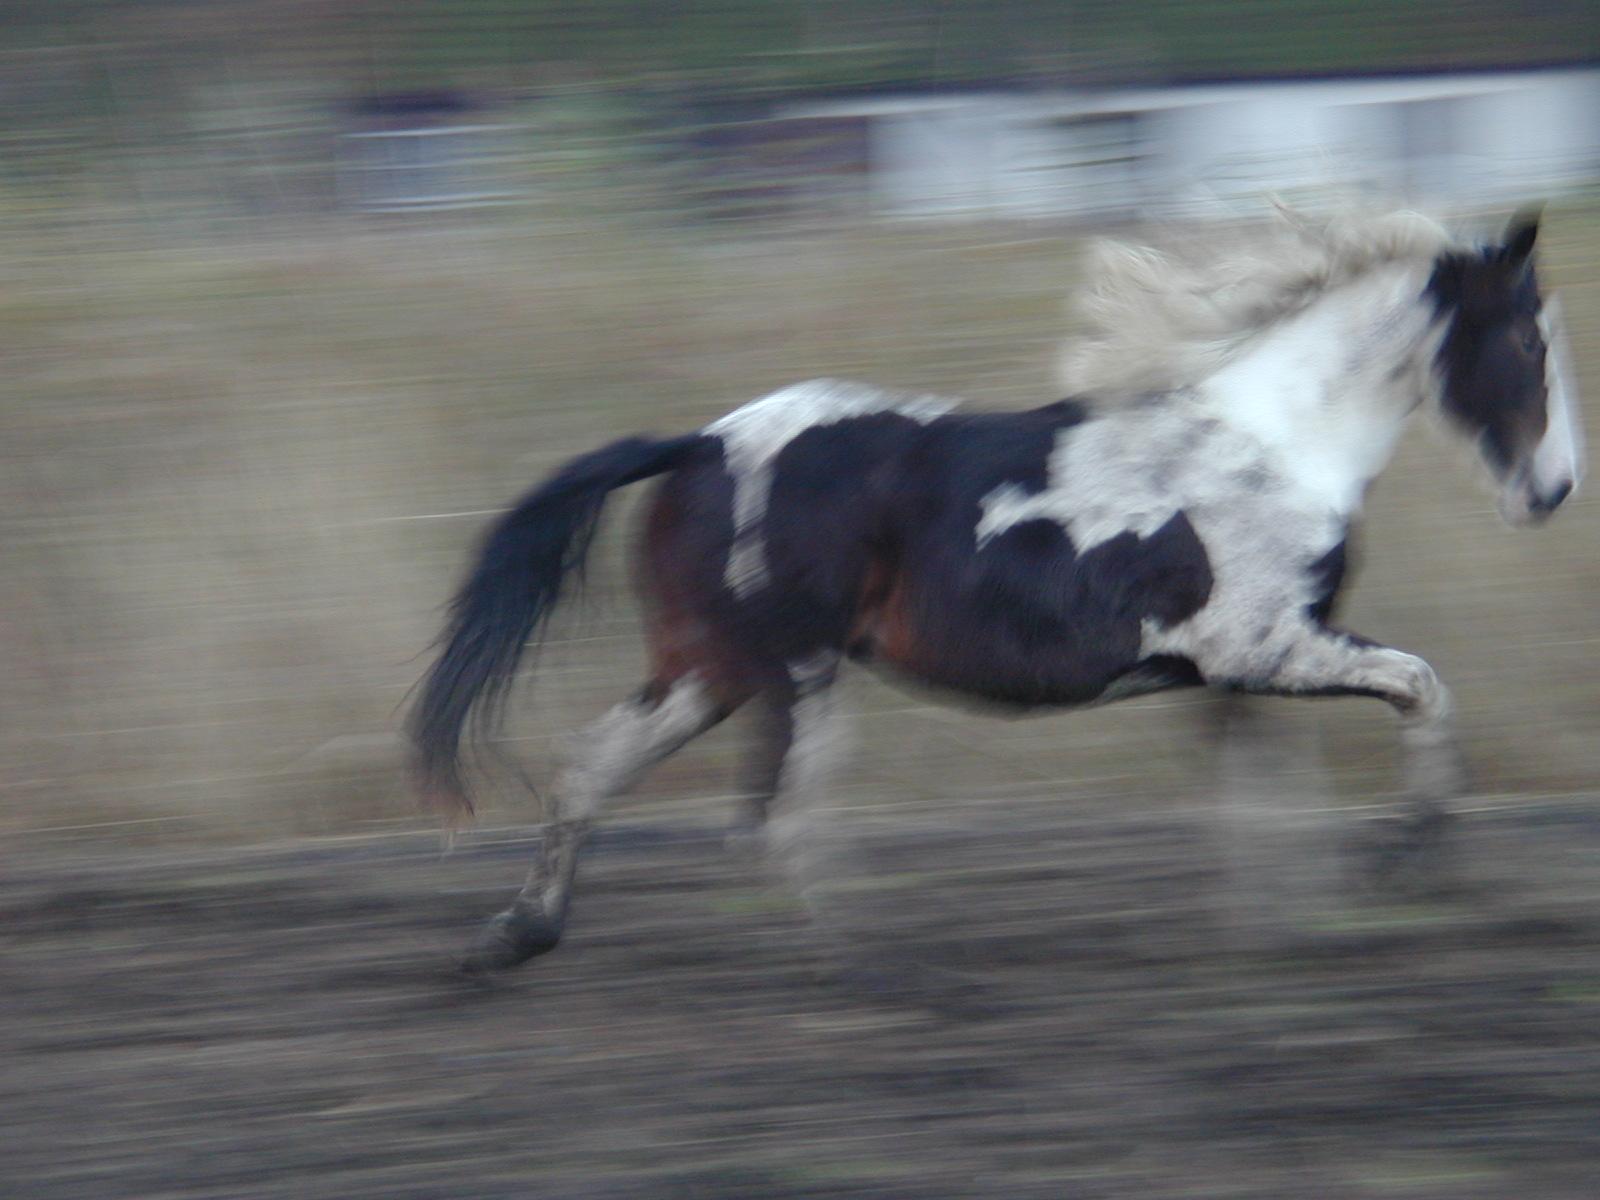 nature animals land horse blur blurs speed running gallopping